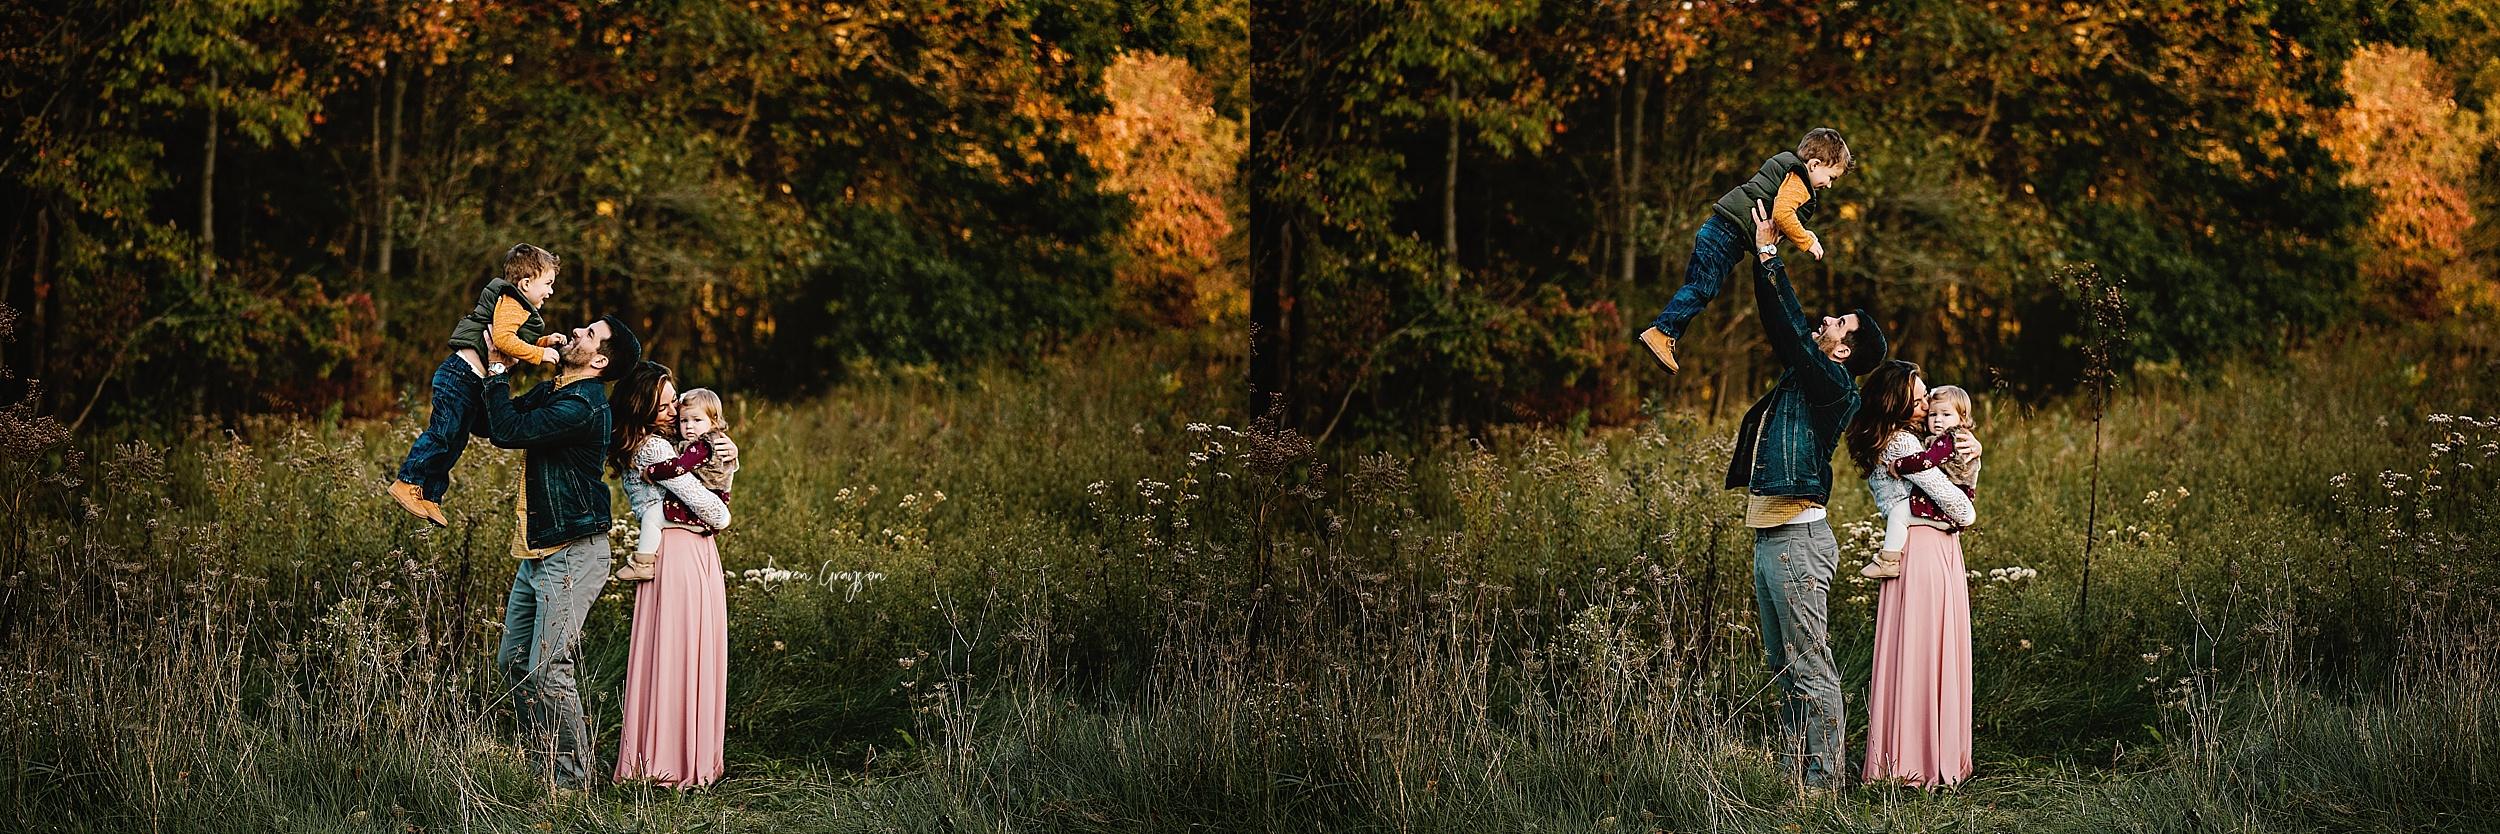 lauren-grayson-photography-akron-photographer-family-carro_0982.jpg